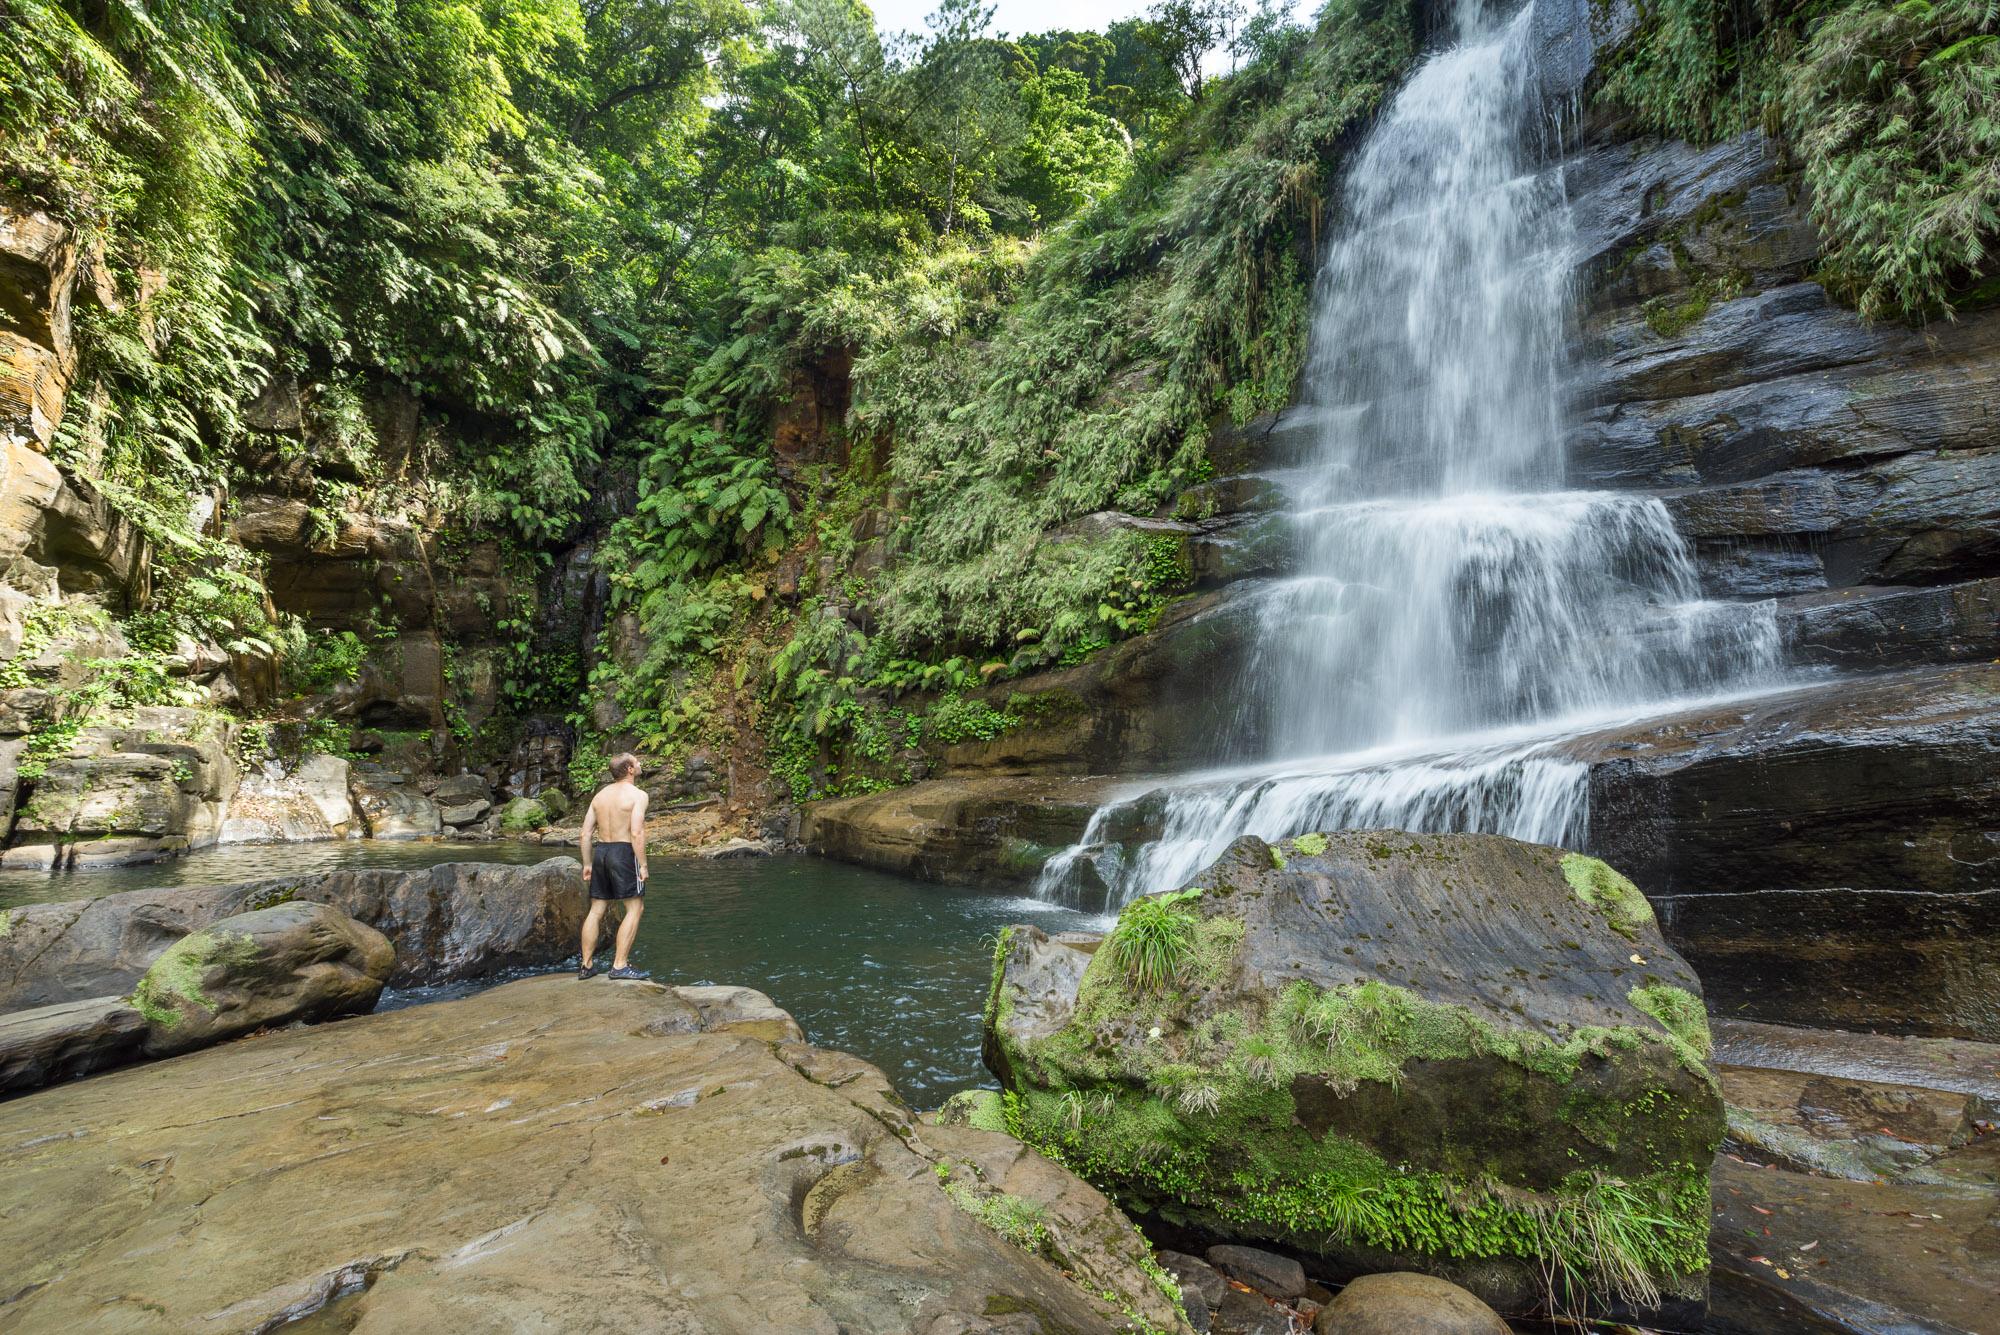 Visit some more remote Waterfalls